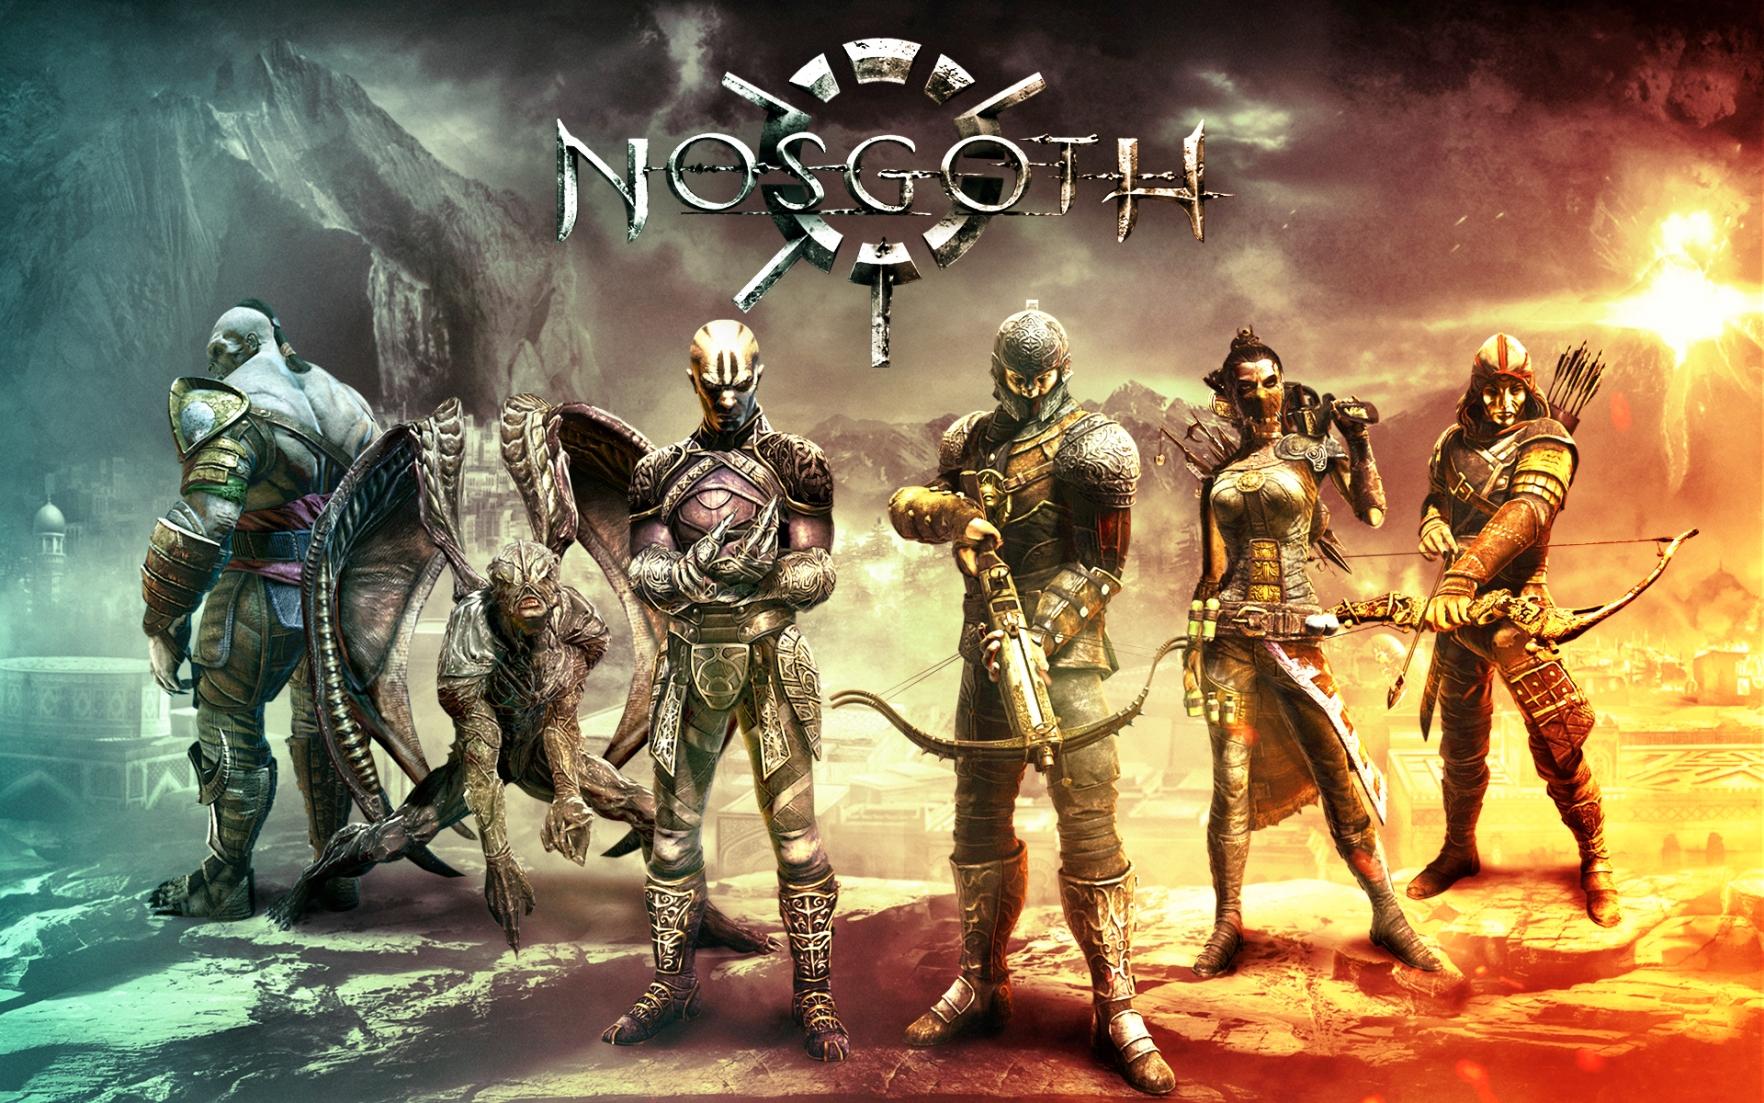 Nosgoth_Factions_1920x1200_1380120121